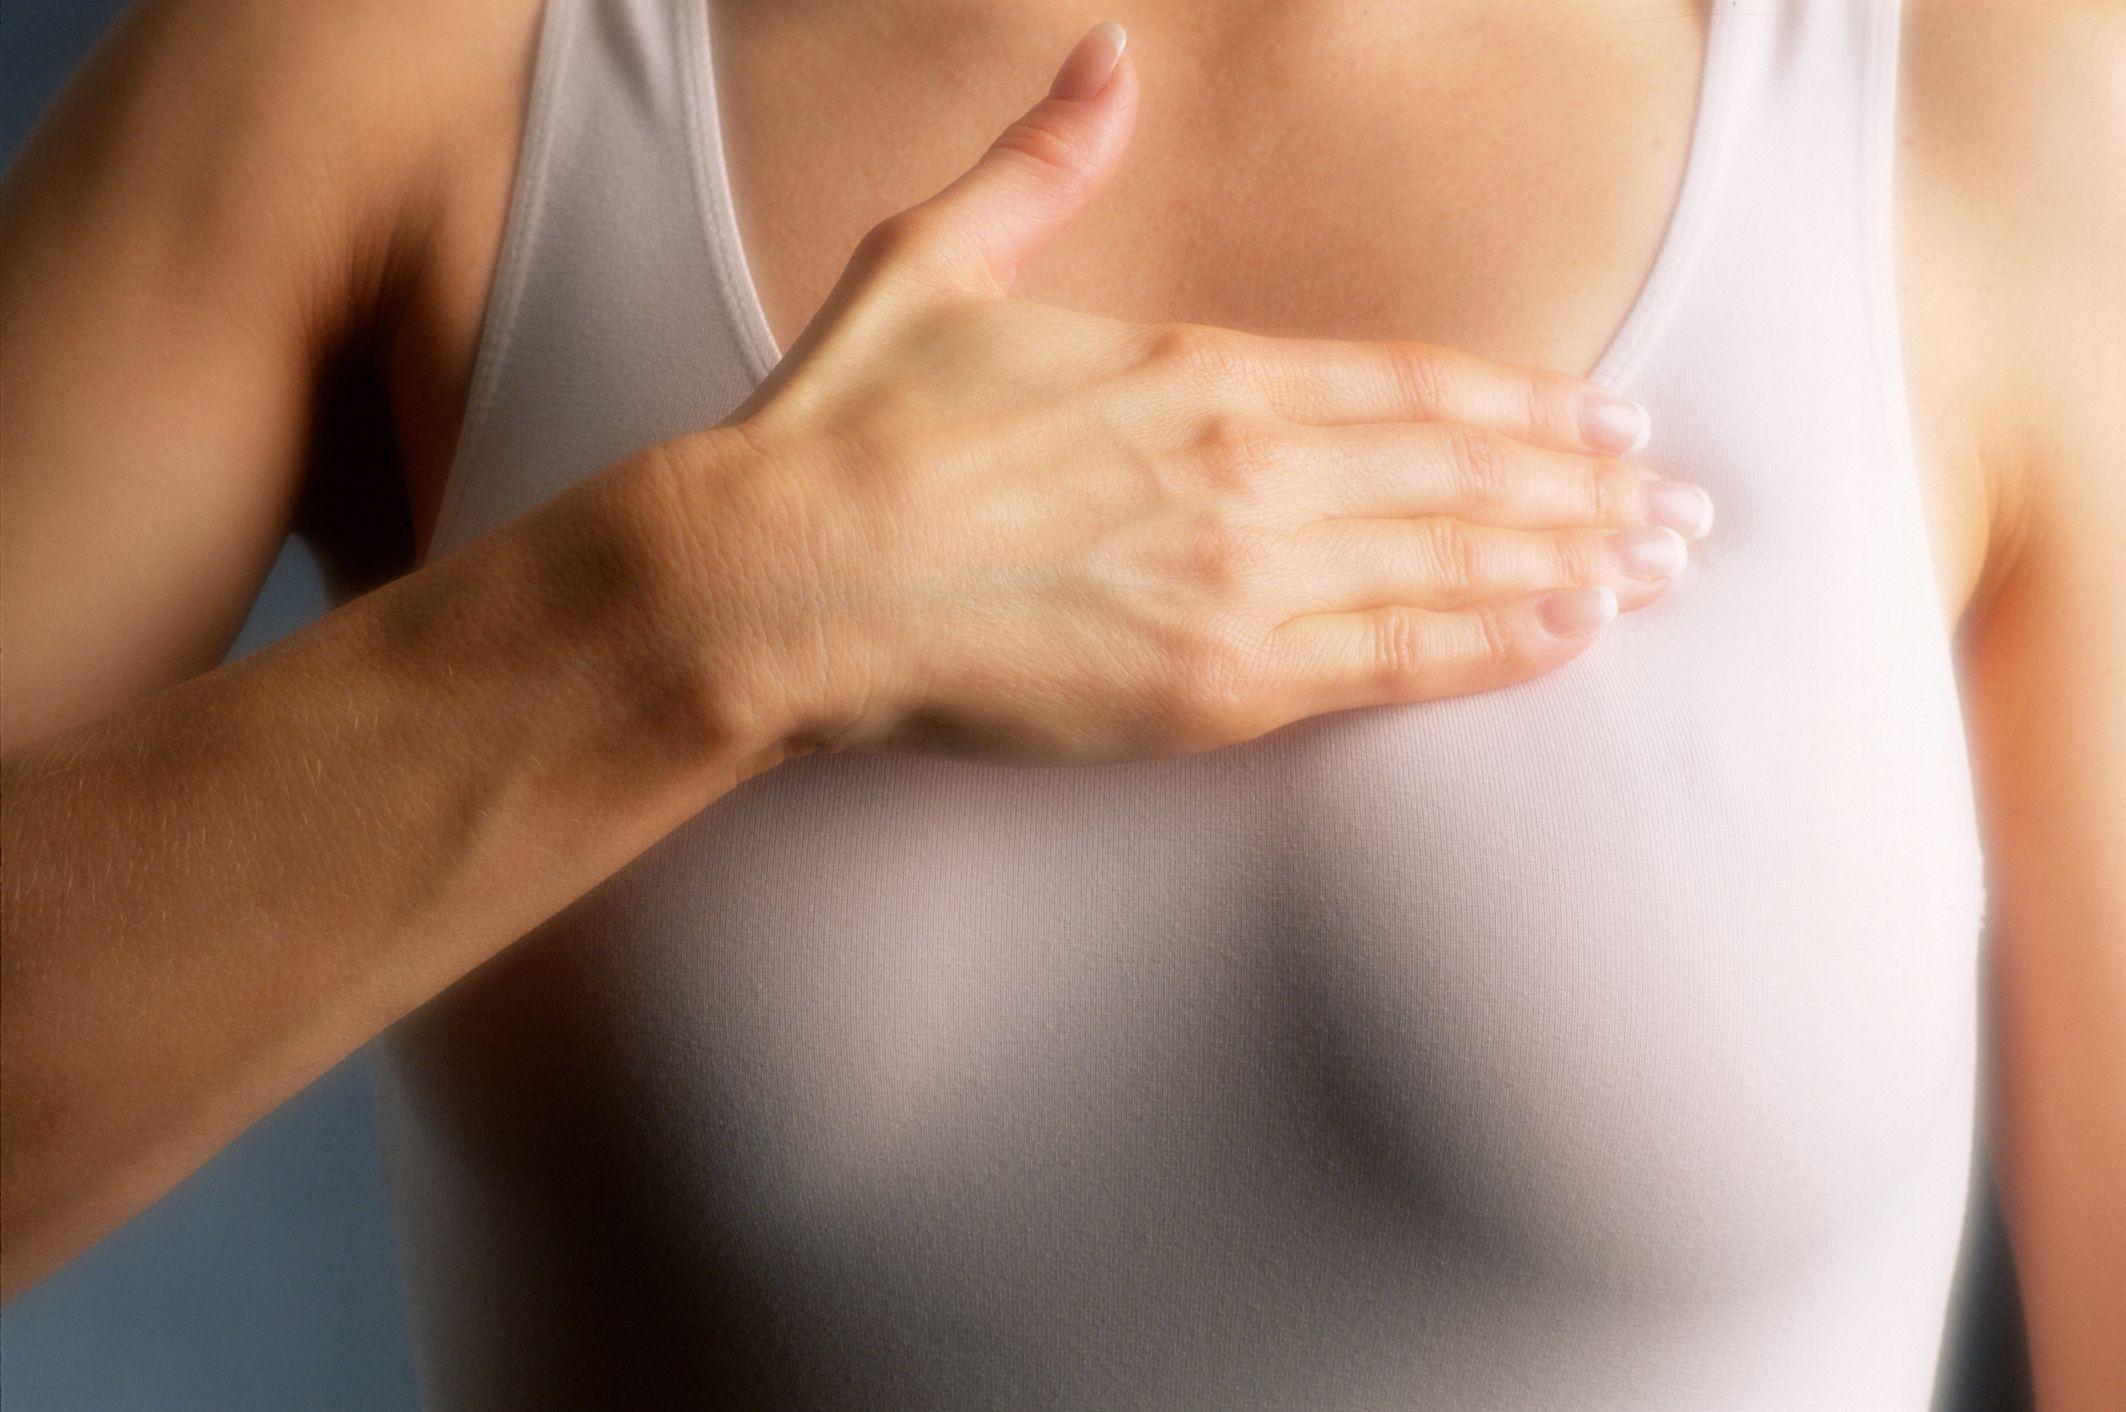 Rash under breast